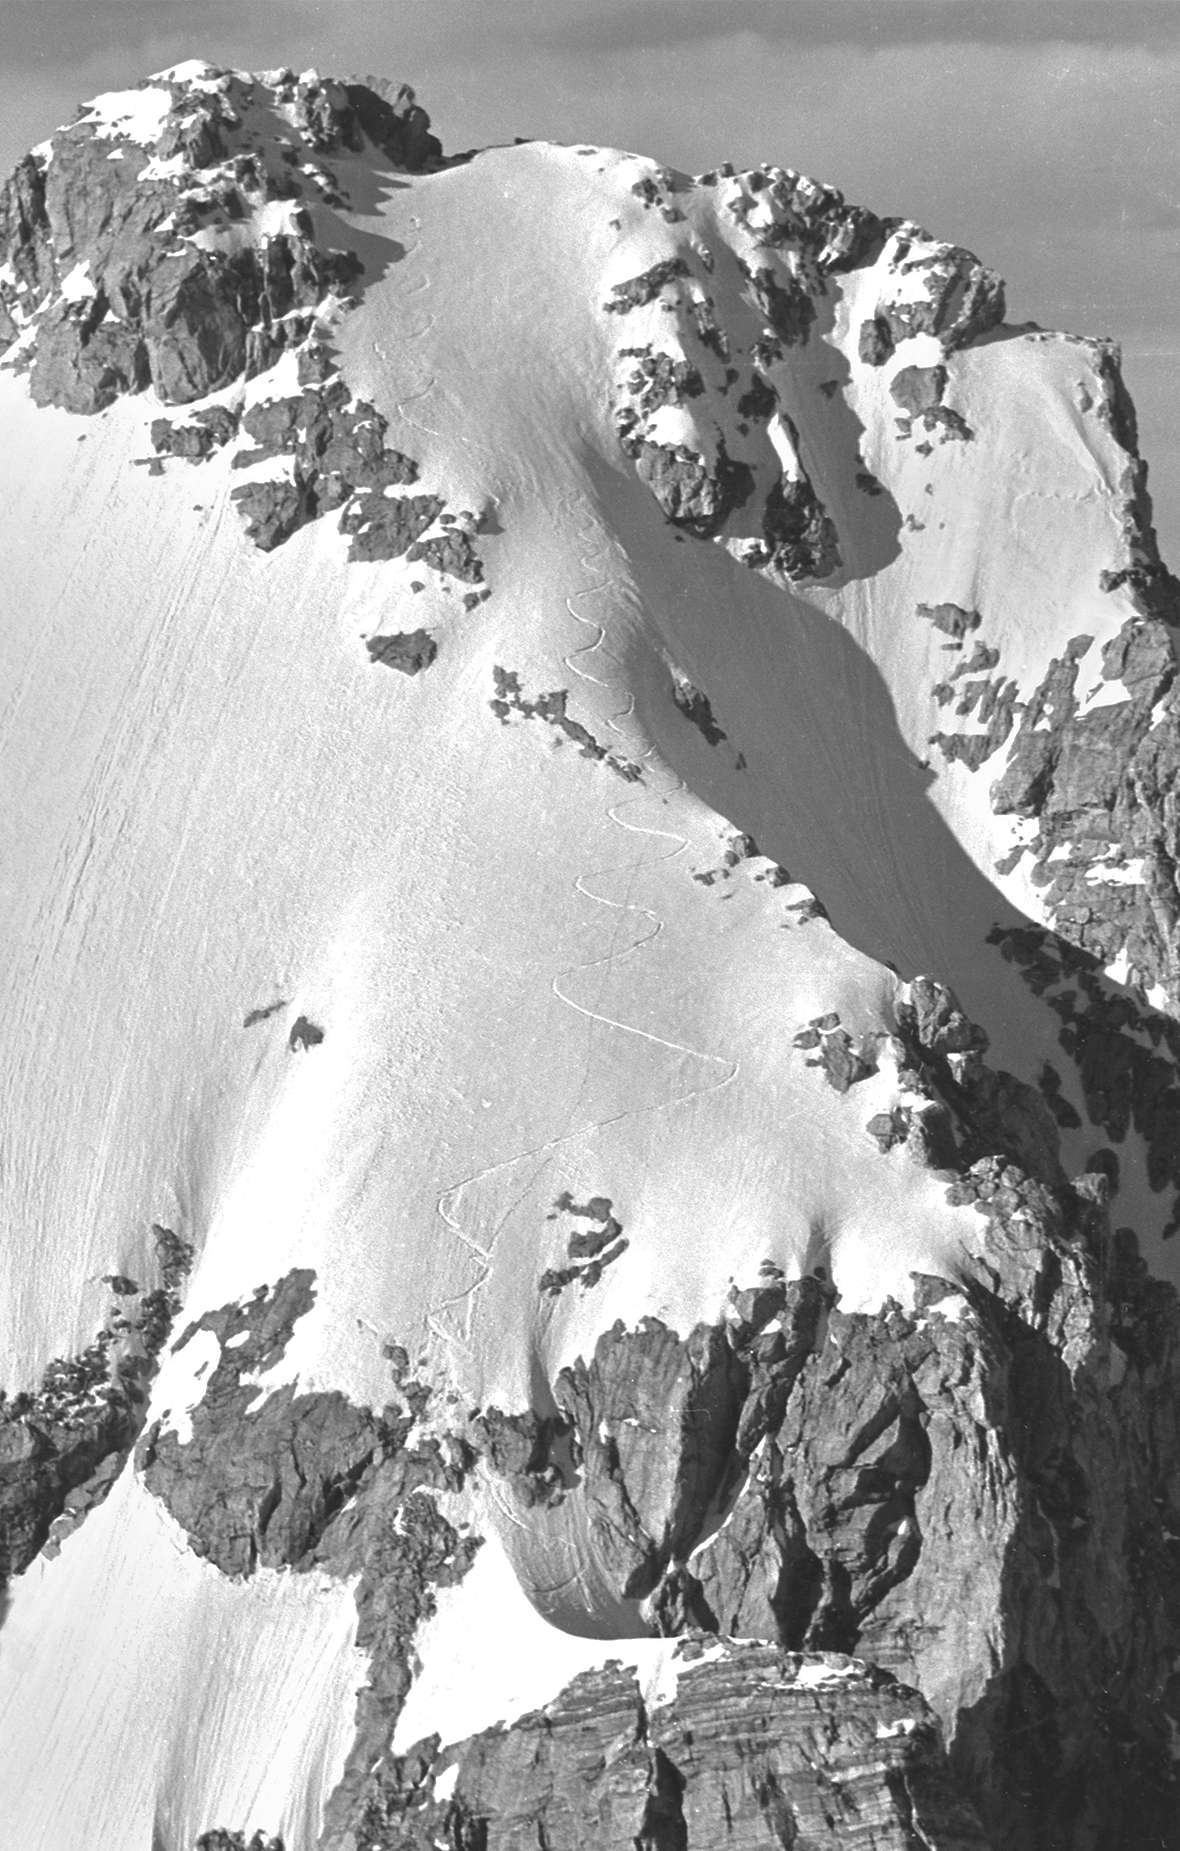 Bill's line down the Grand Teton